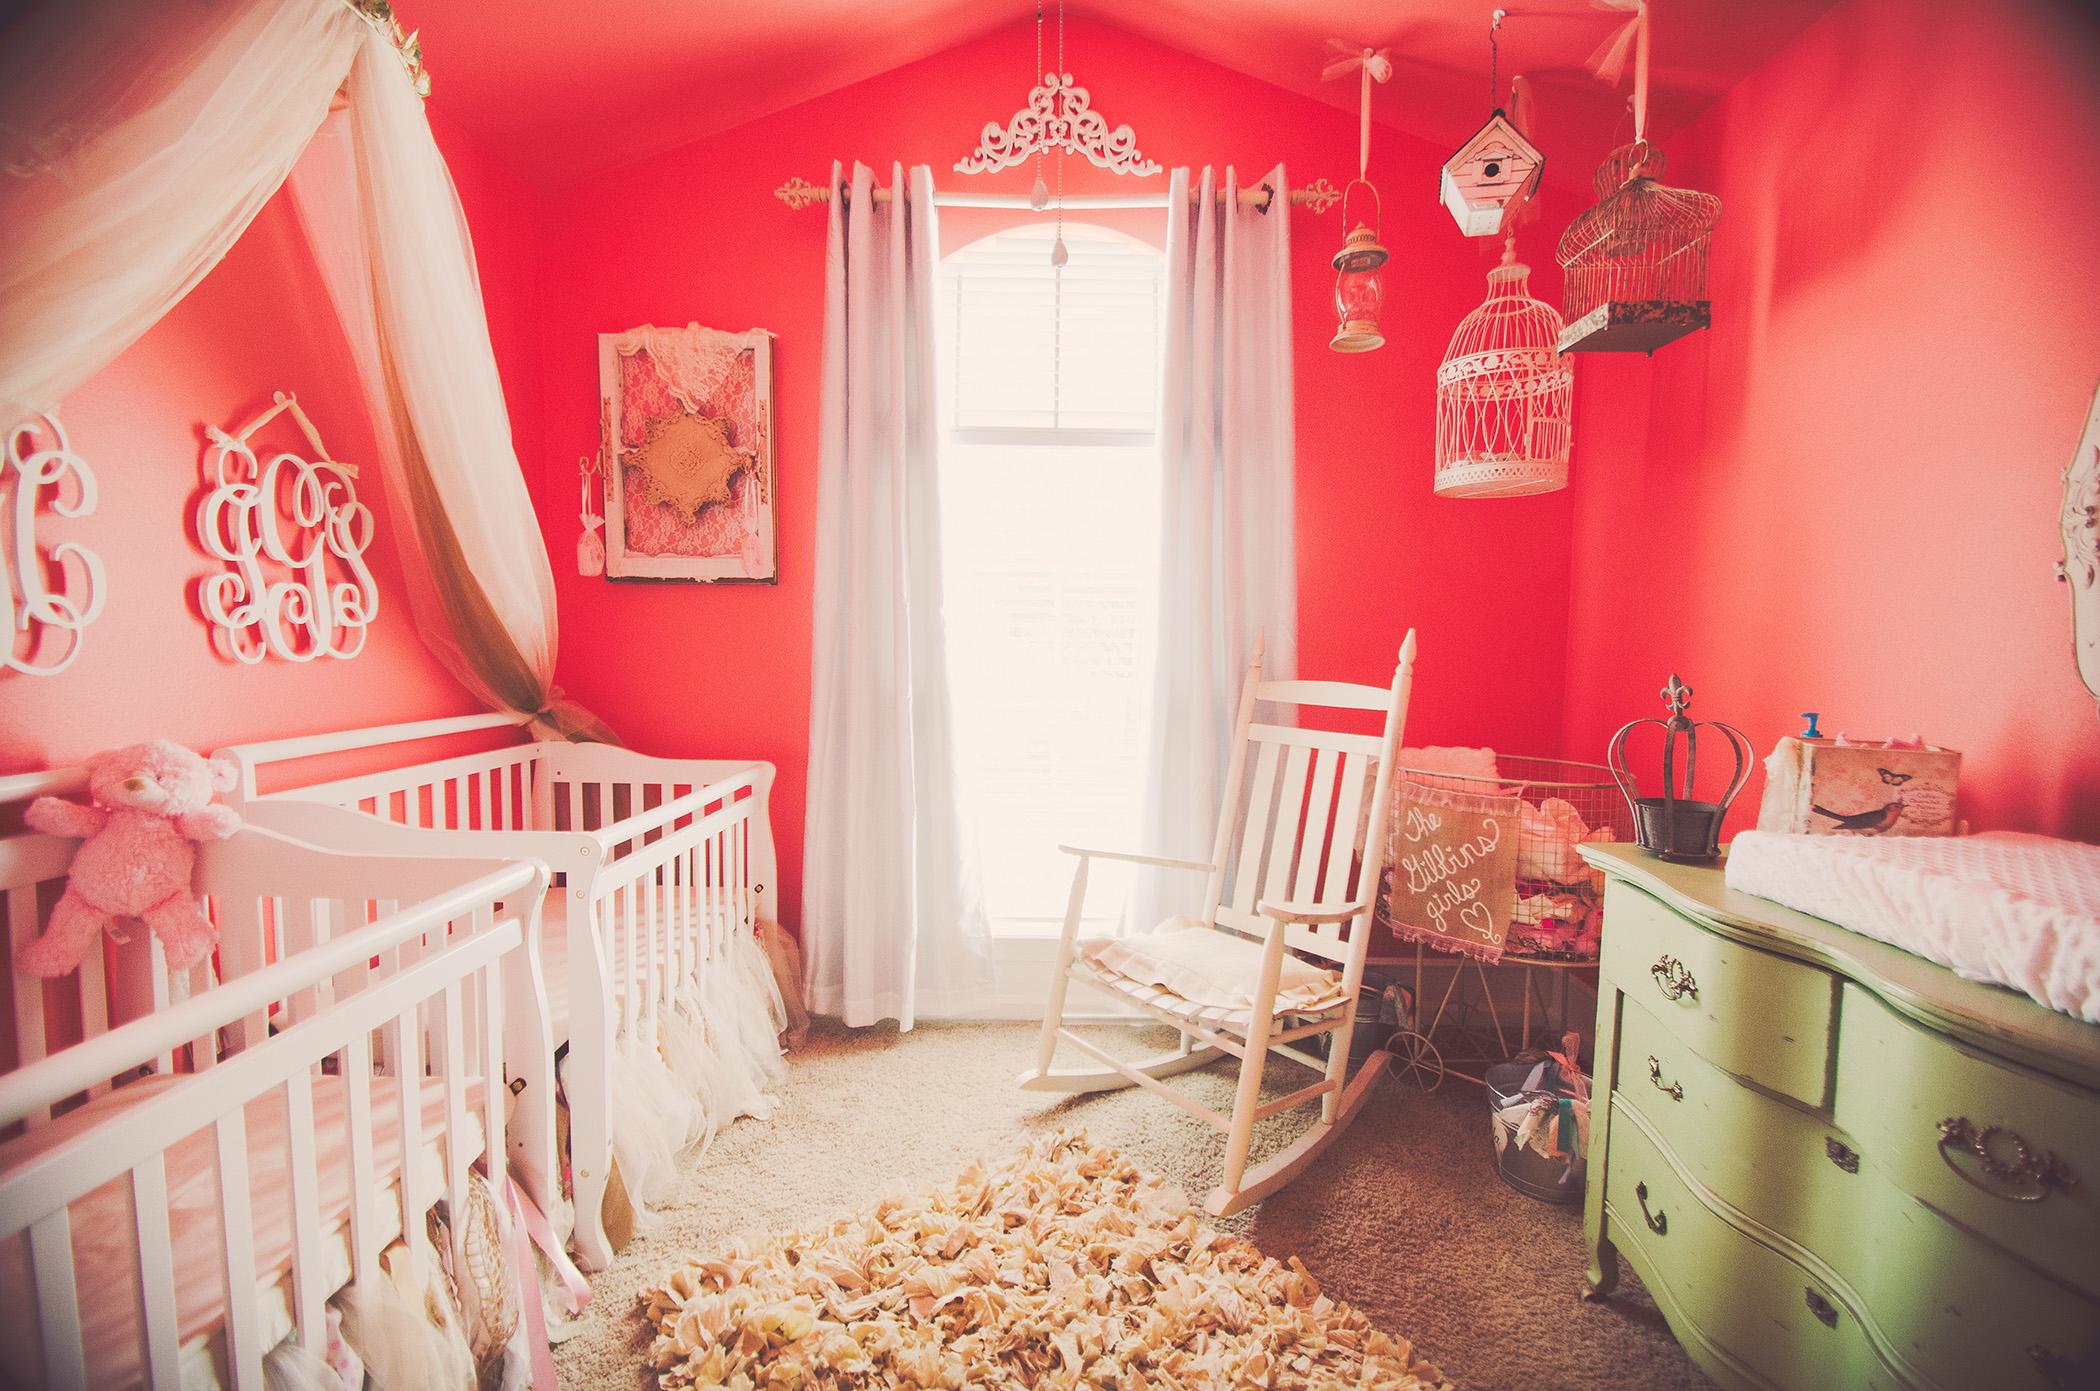 What a wonderful room!!!